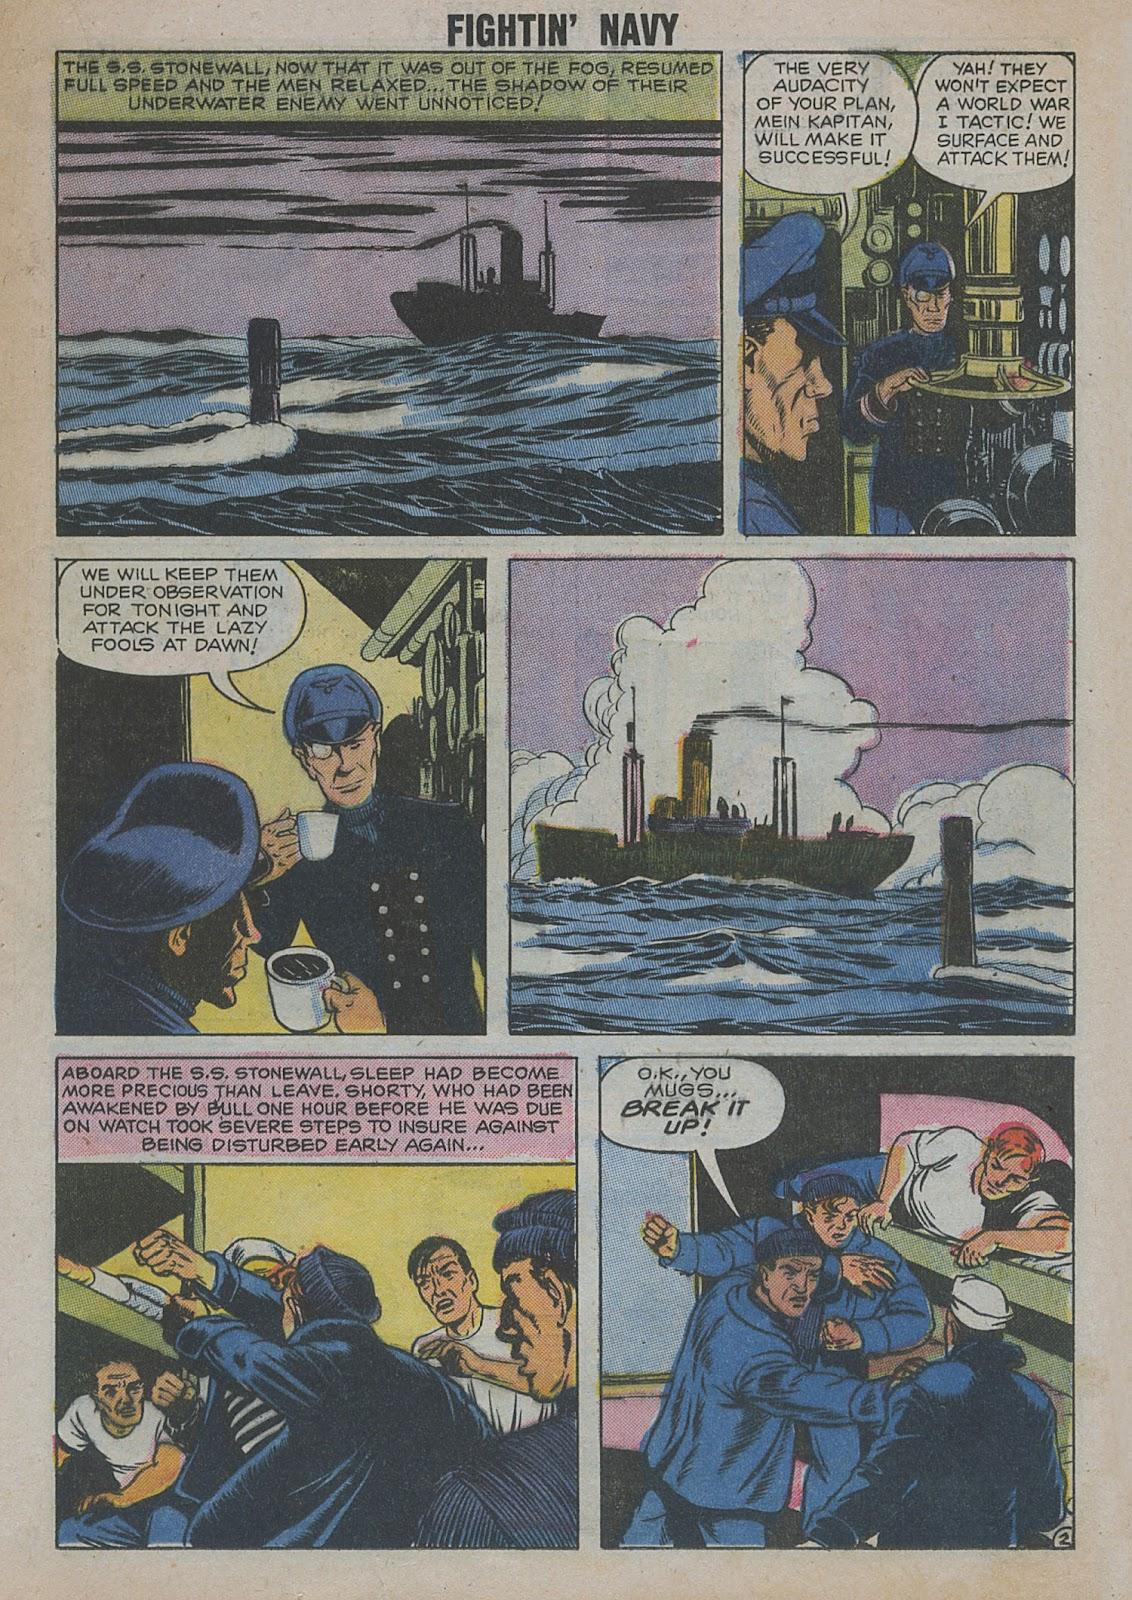 Read online Fightin' Navy comic -  Issue #82 - 23